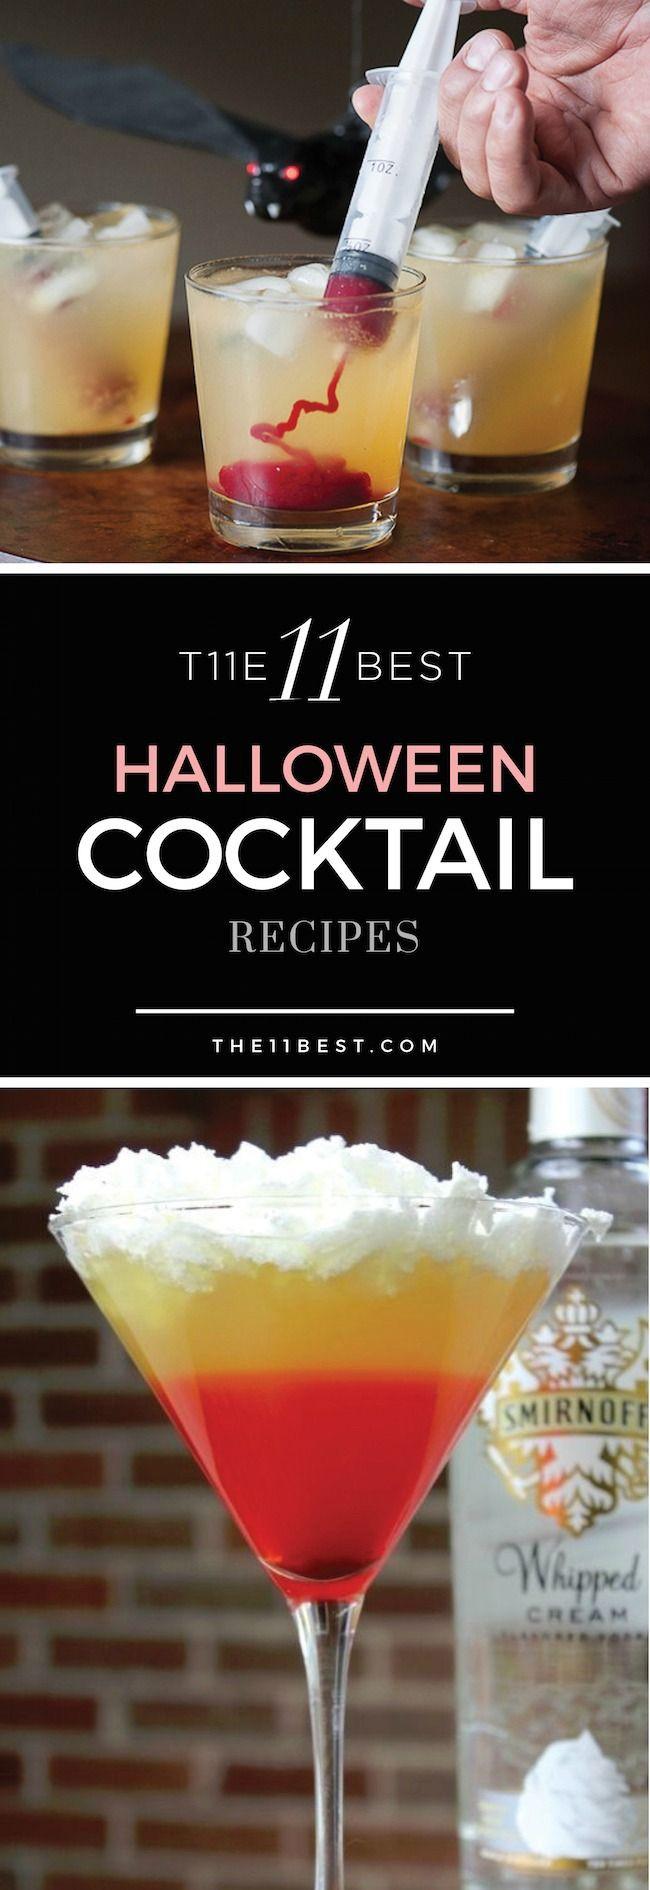 Best Halloween Drinks  The 11 Best Halloween Cocktail Recipe Ideas